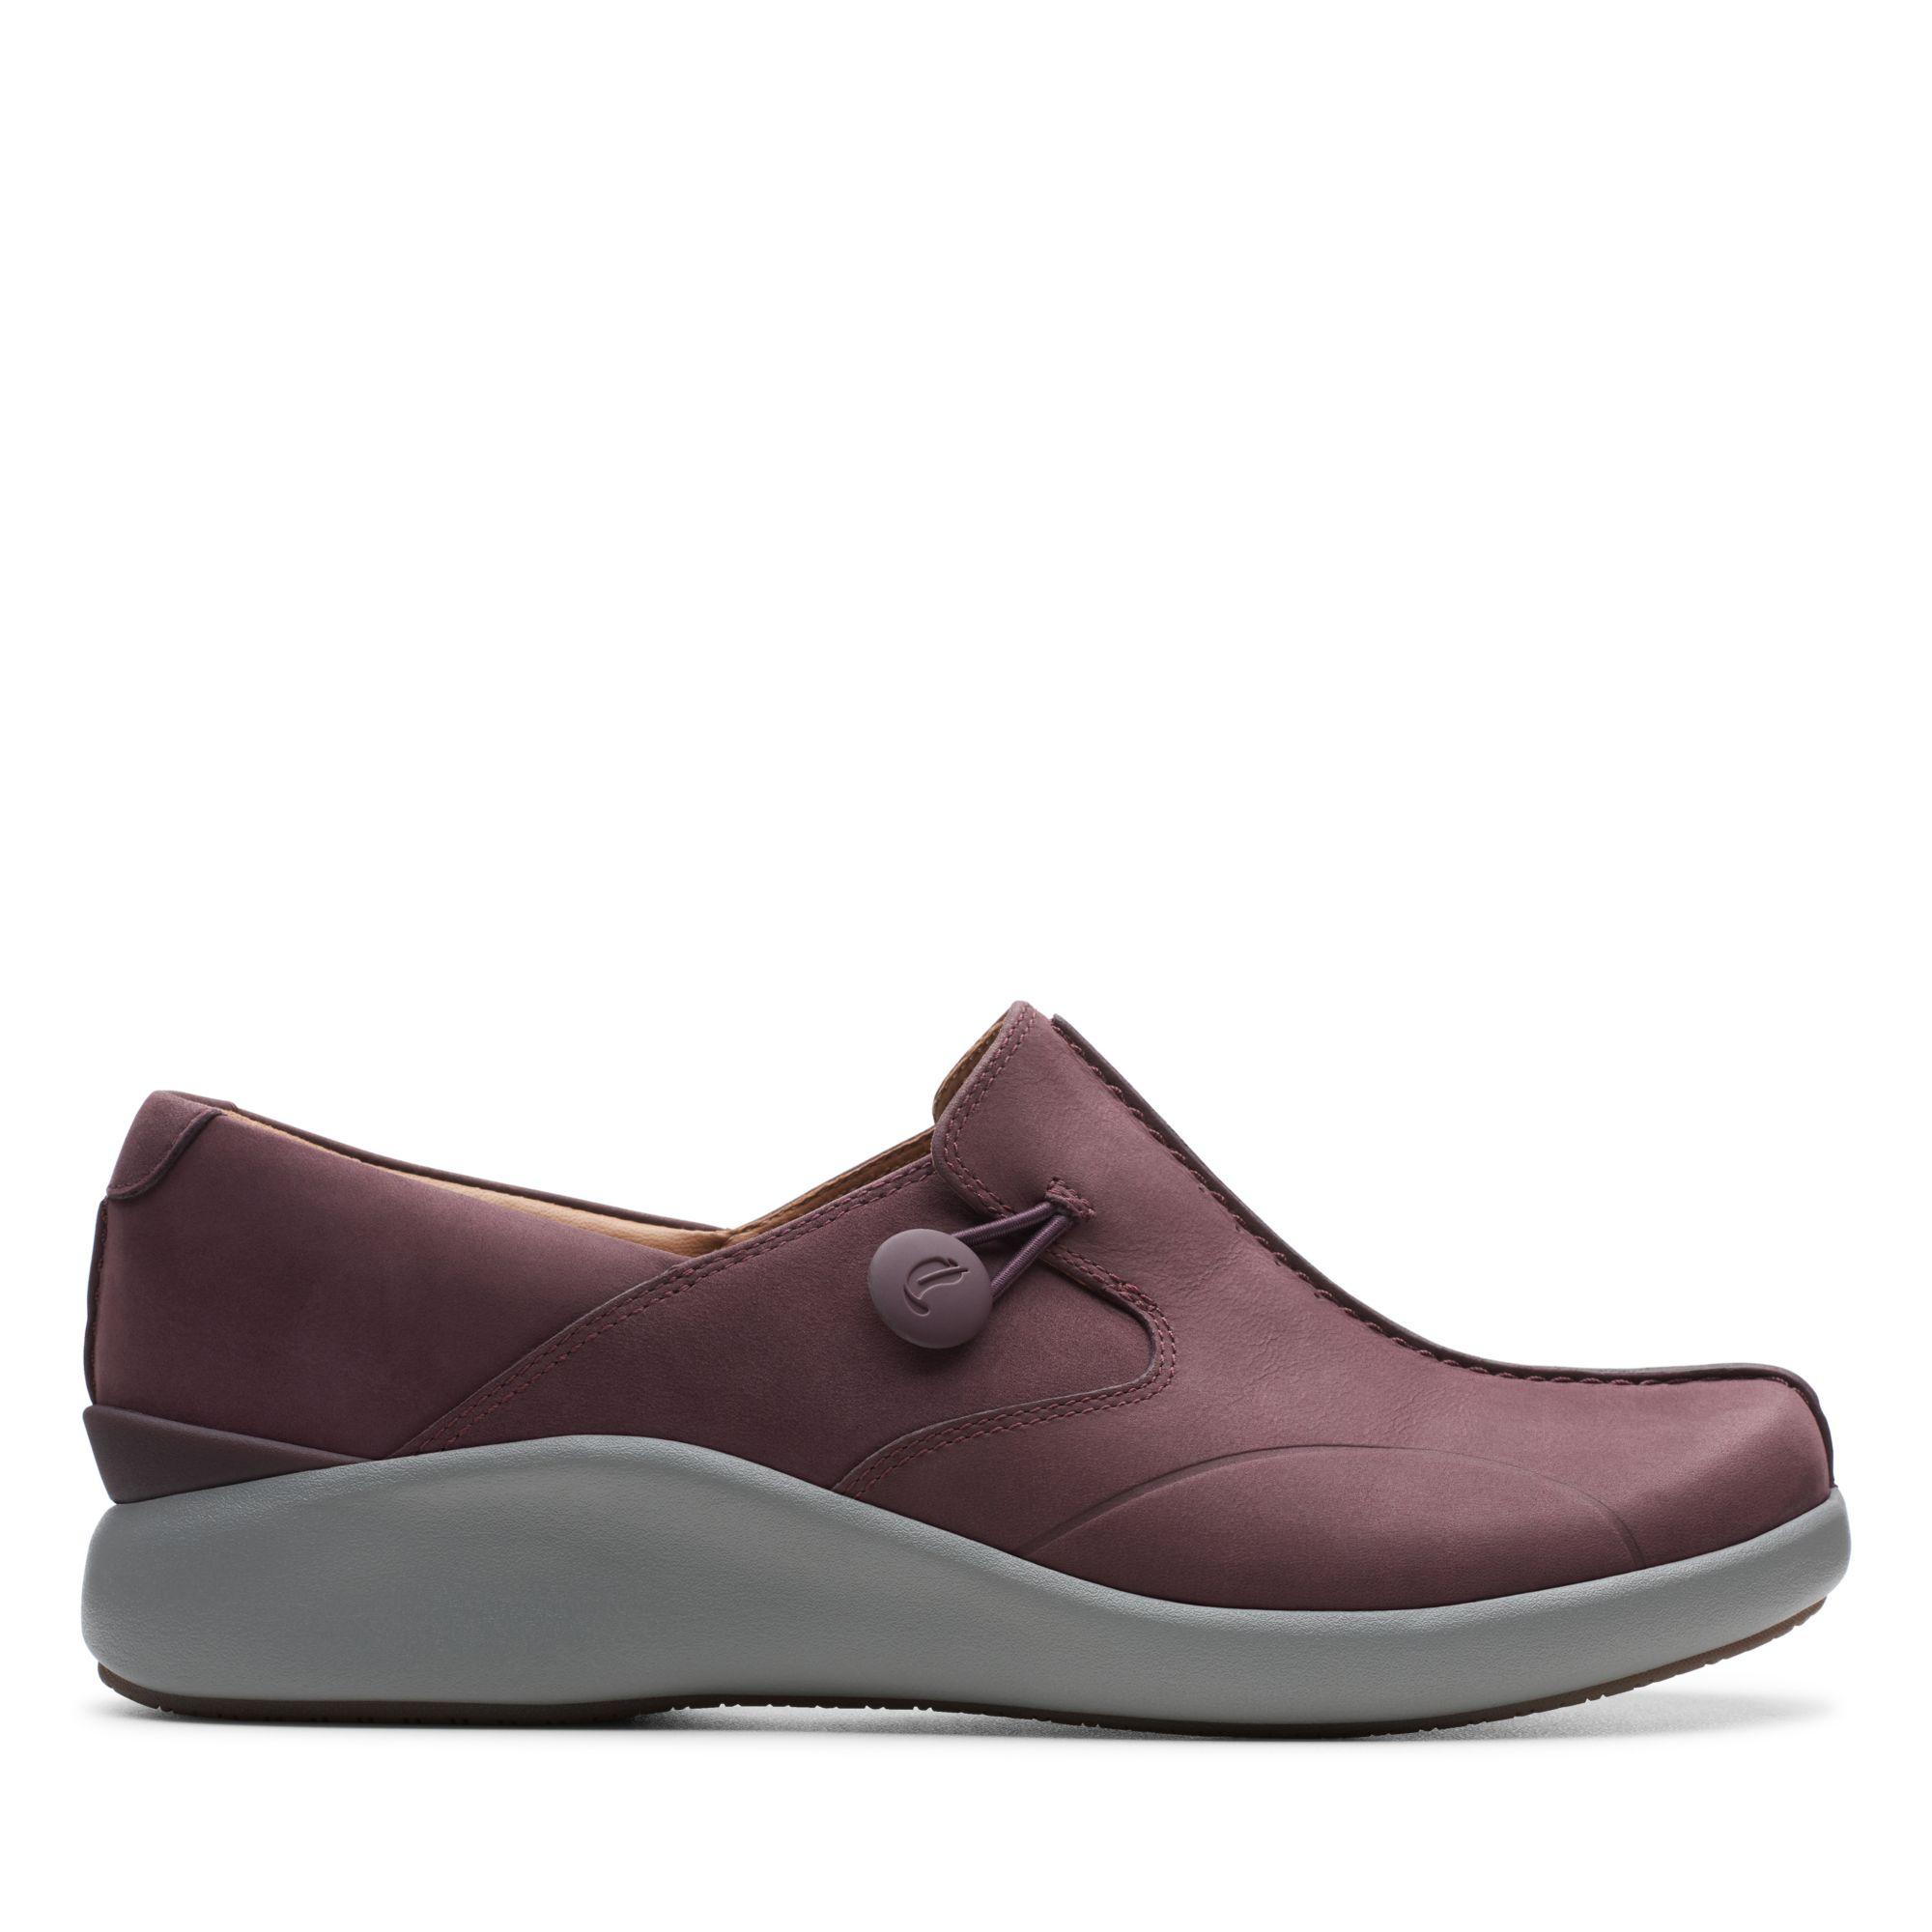 Clarks摩登經典-Un. Loop2 Walk(紫紅色)